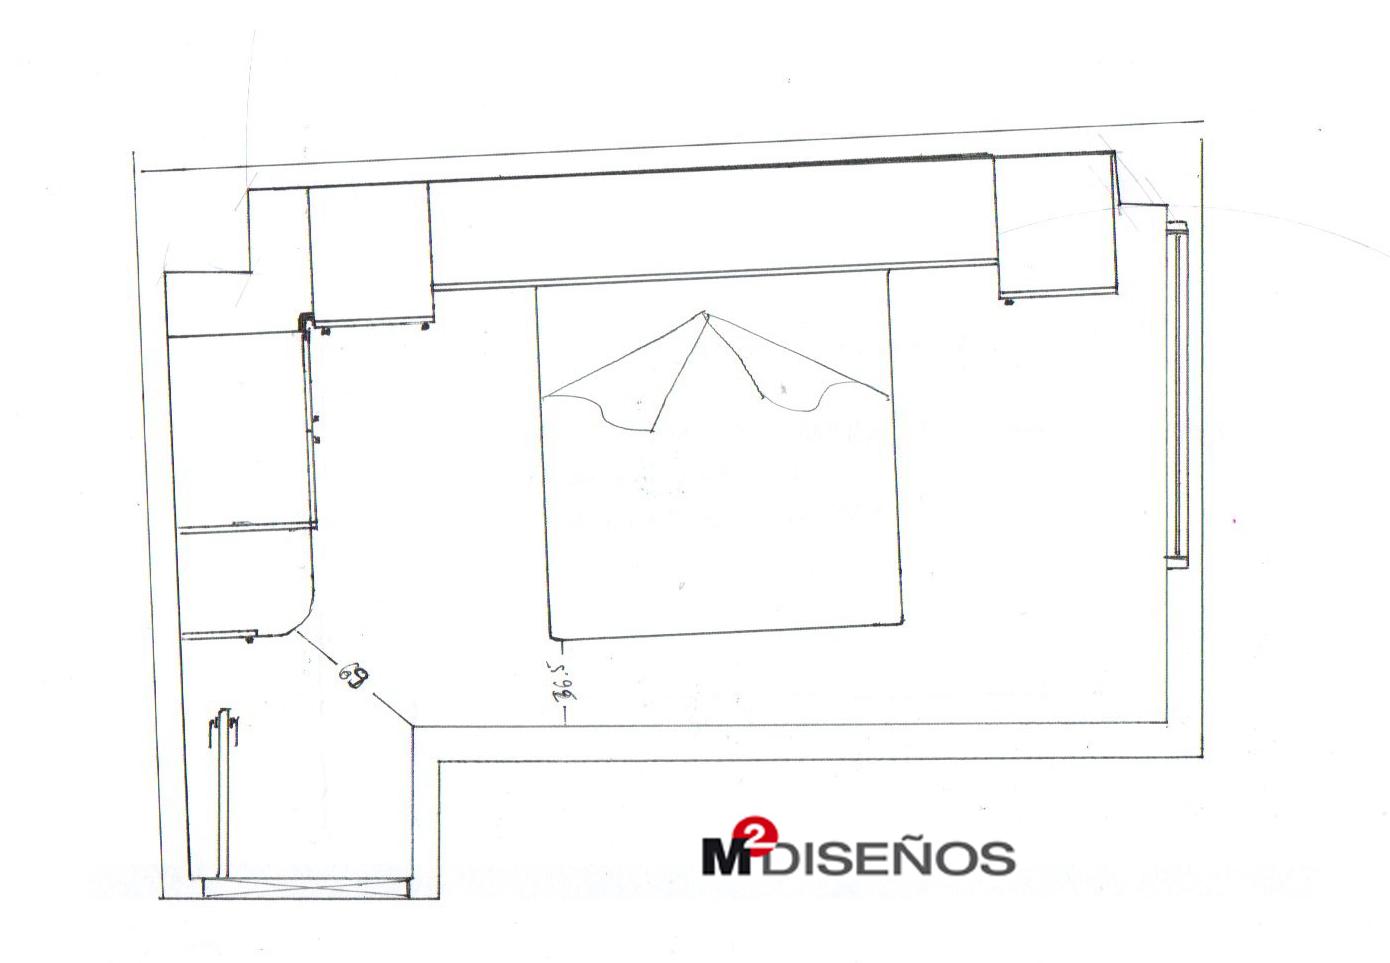 Dormitorio matrimonio puente de 10 12 m m dise os for Hacer plano habitacion